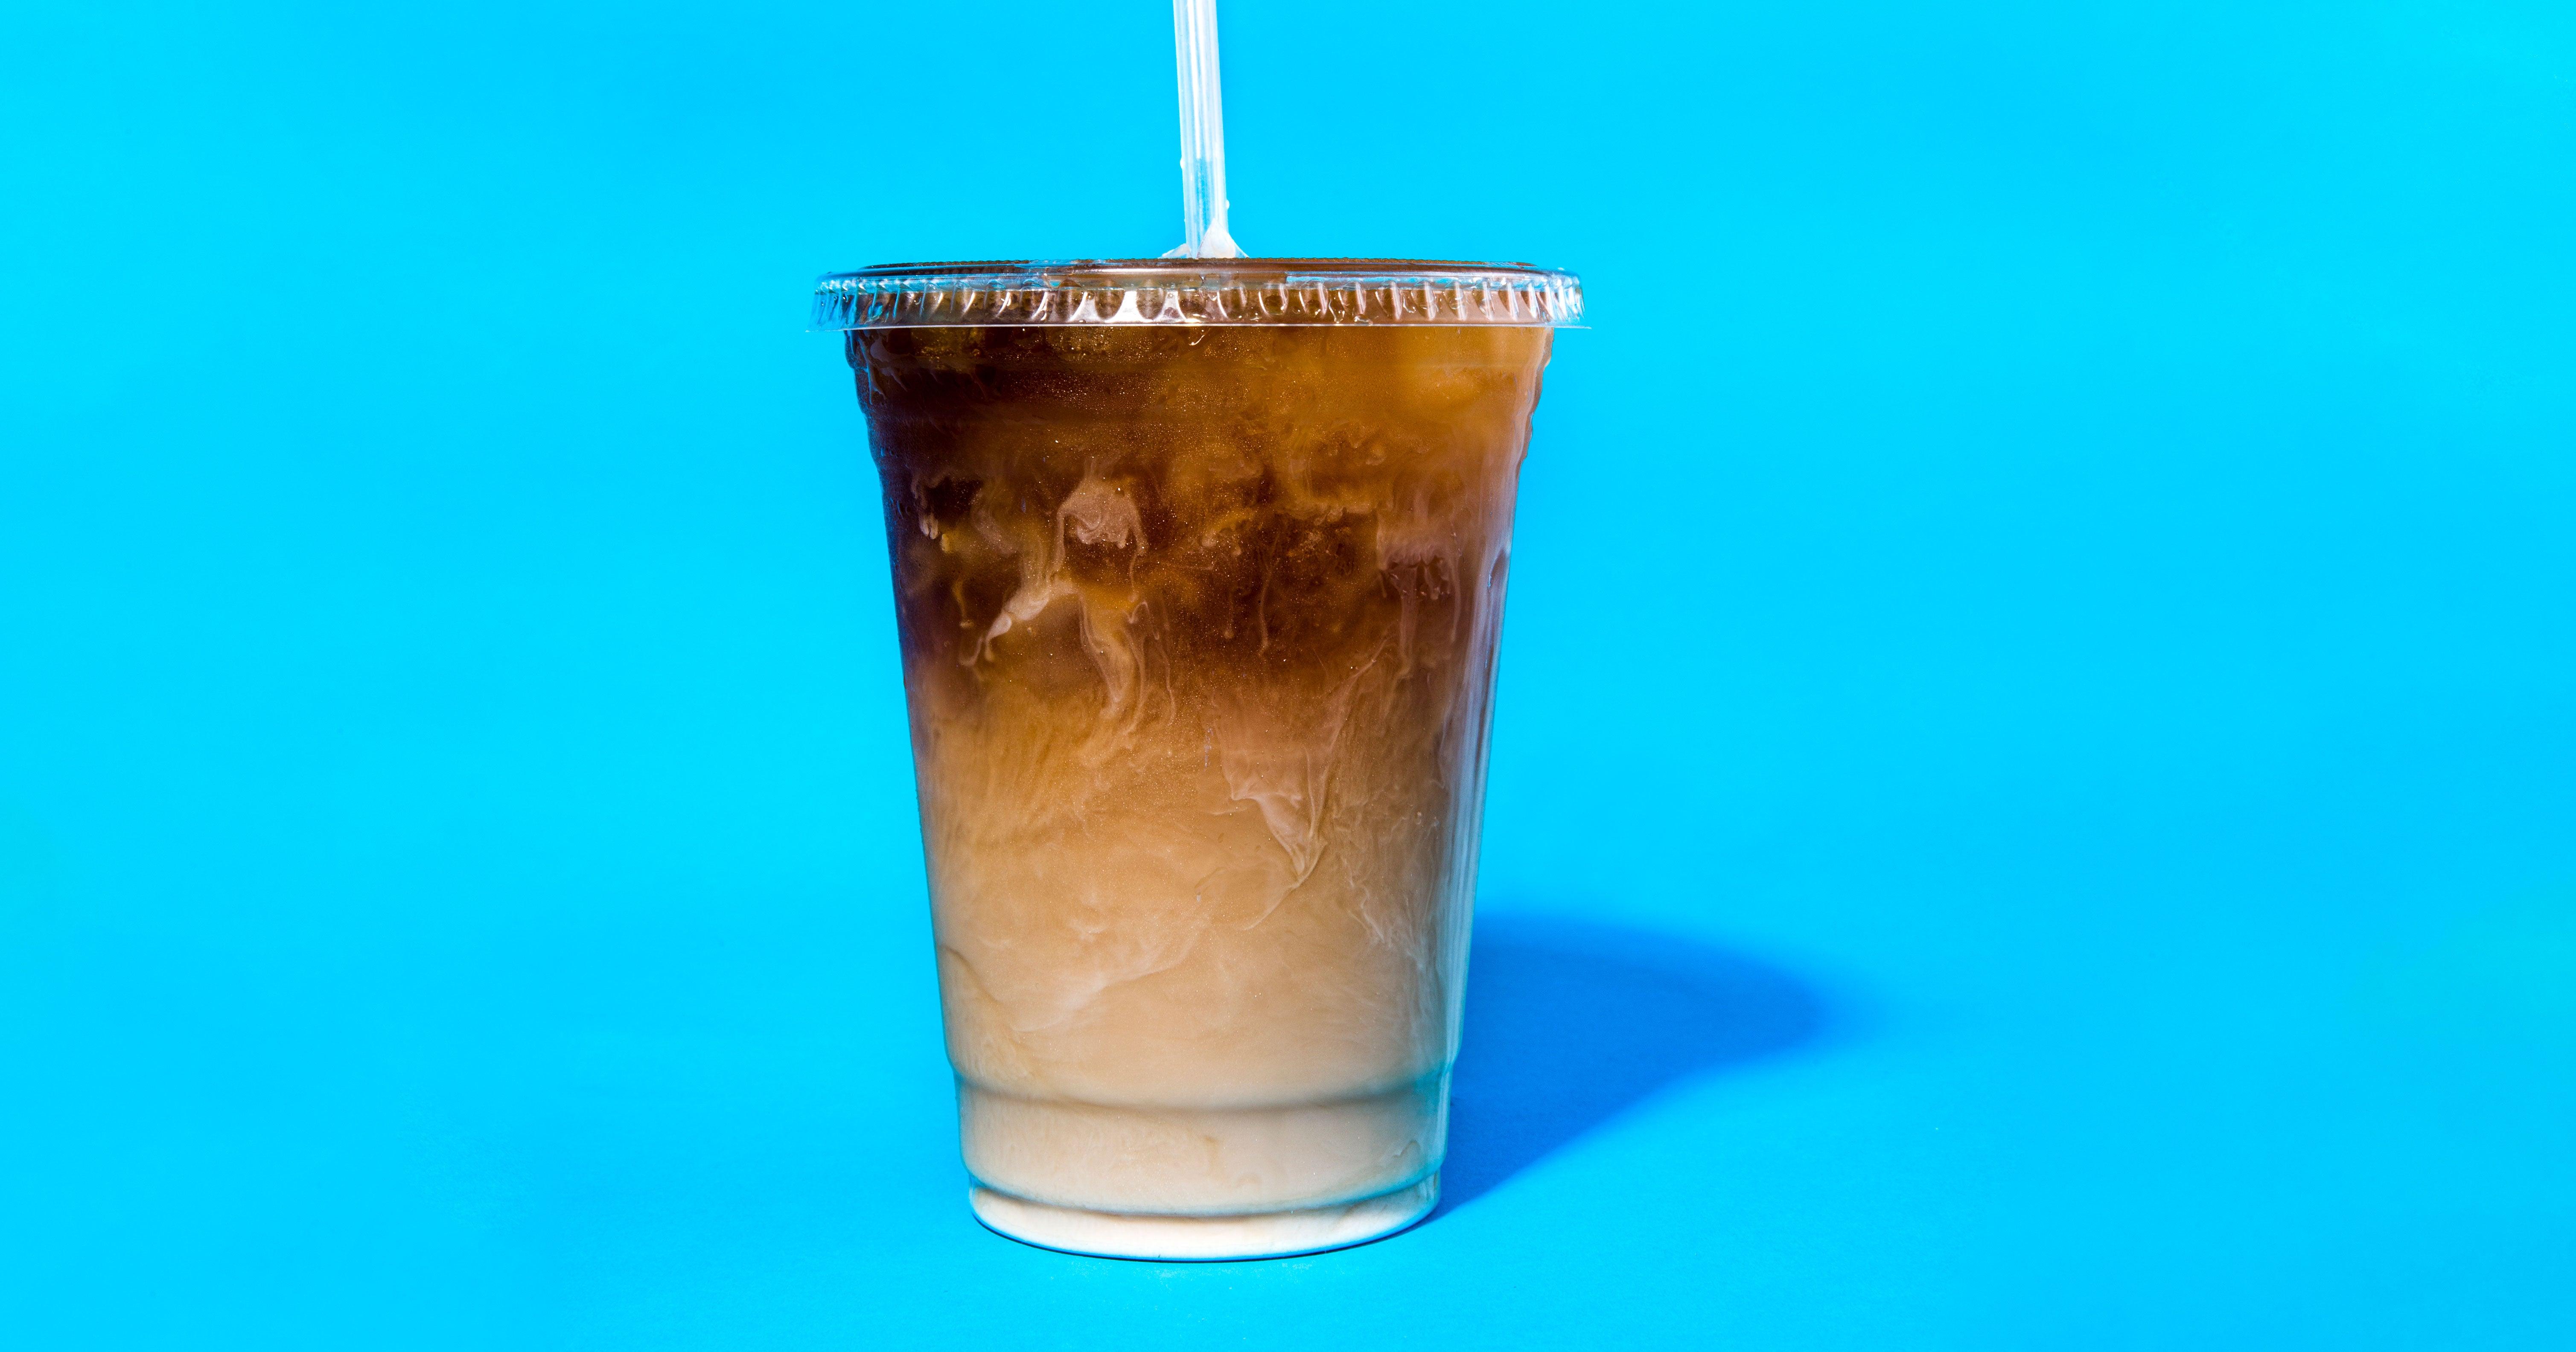 How To Make Dalgona Coffee Recipe From New Tiktok Trend